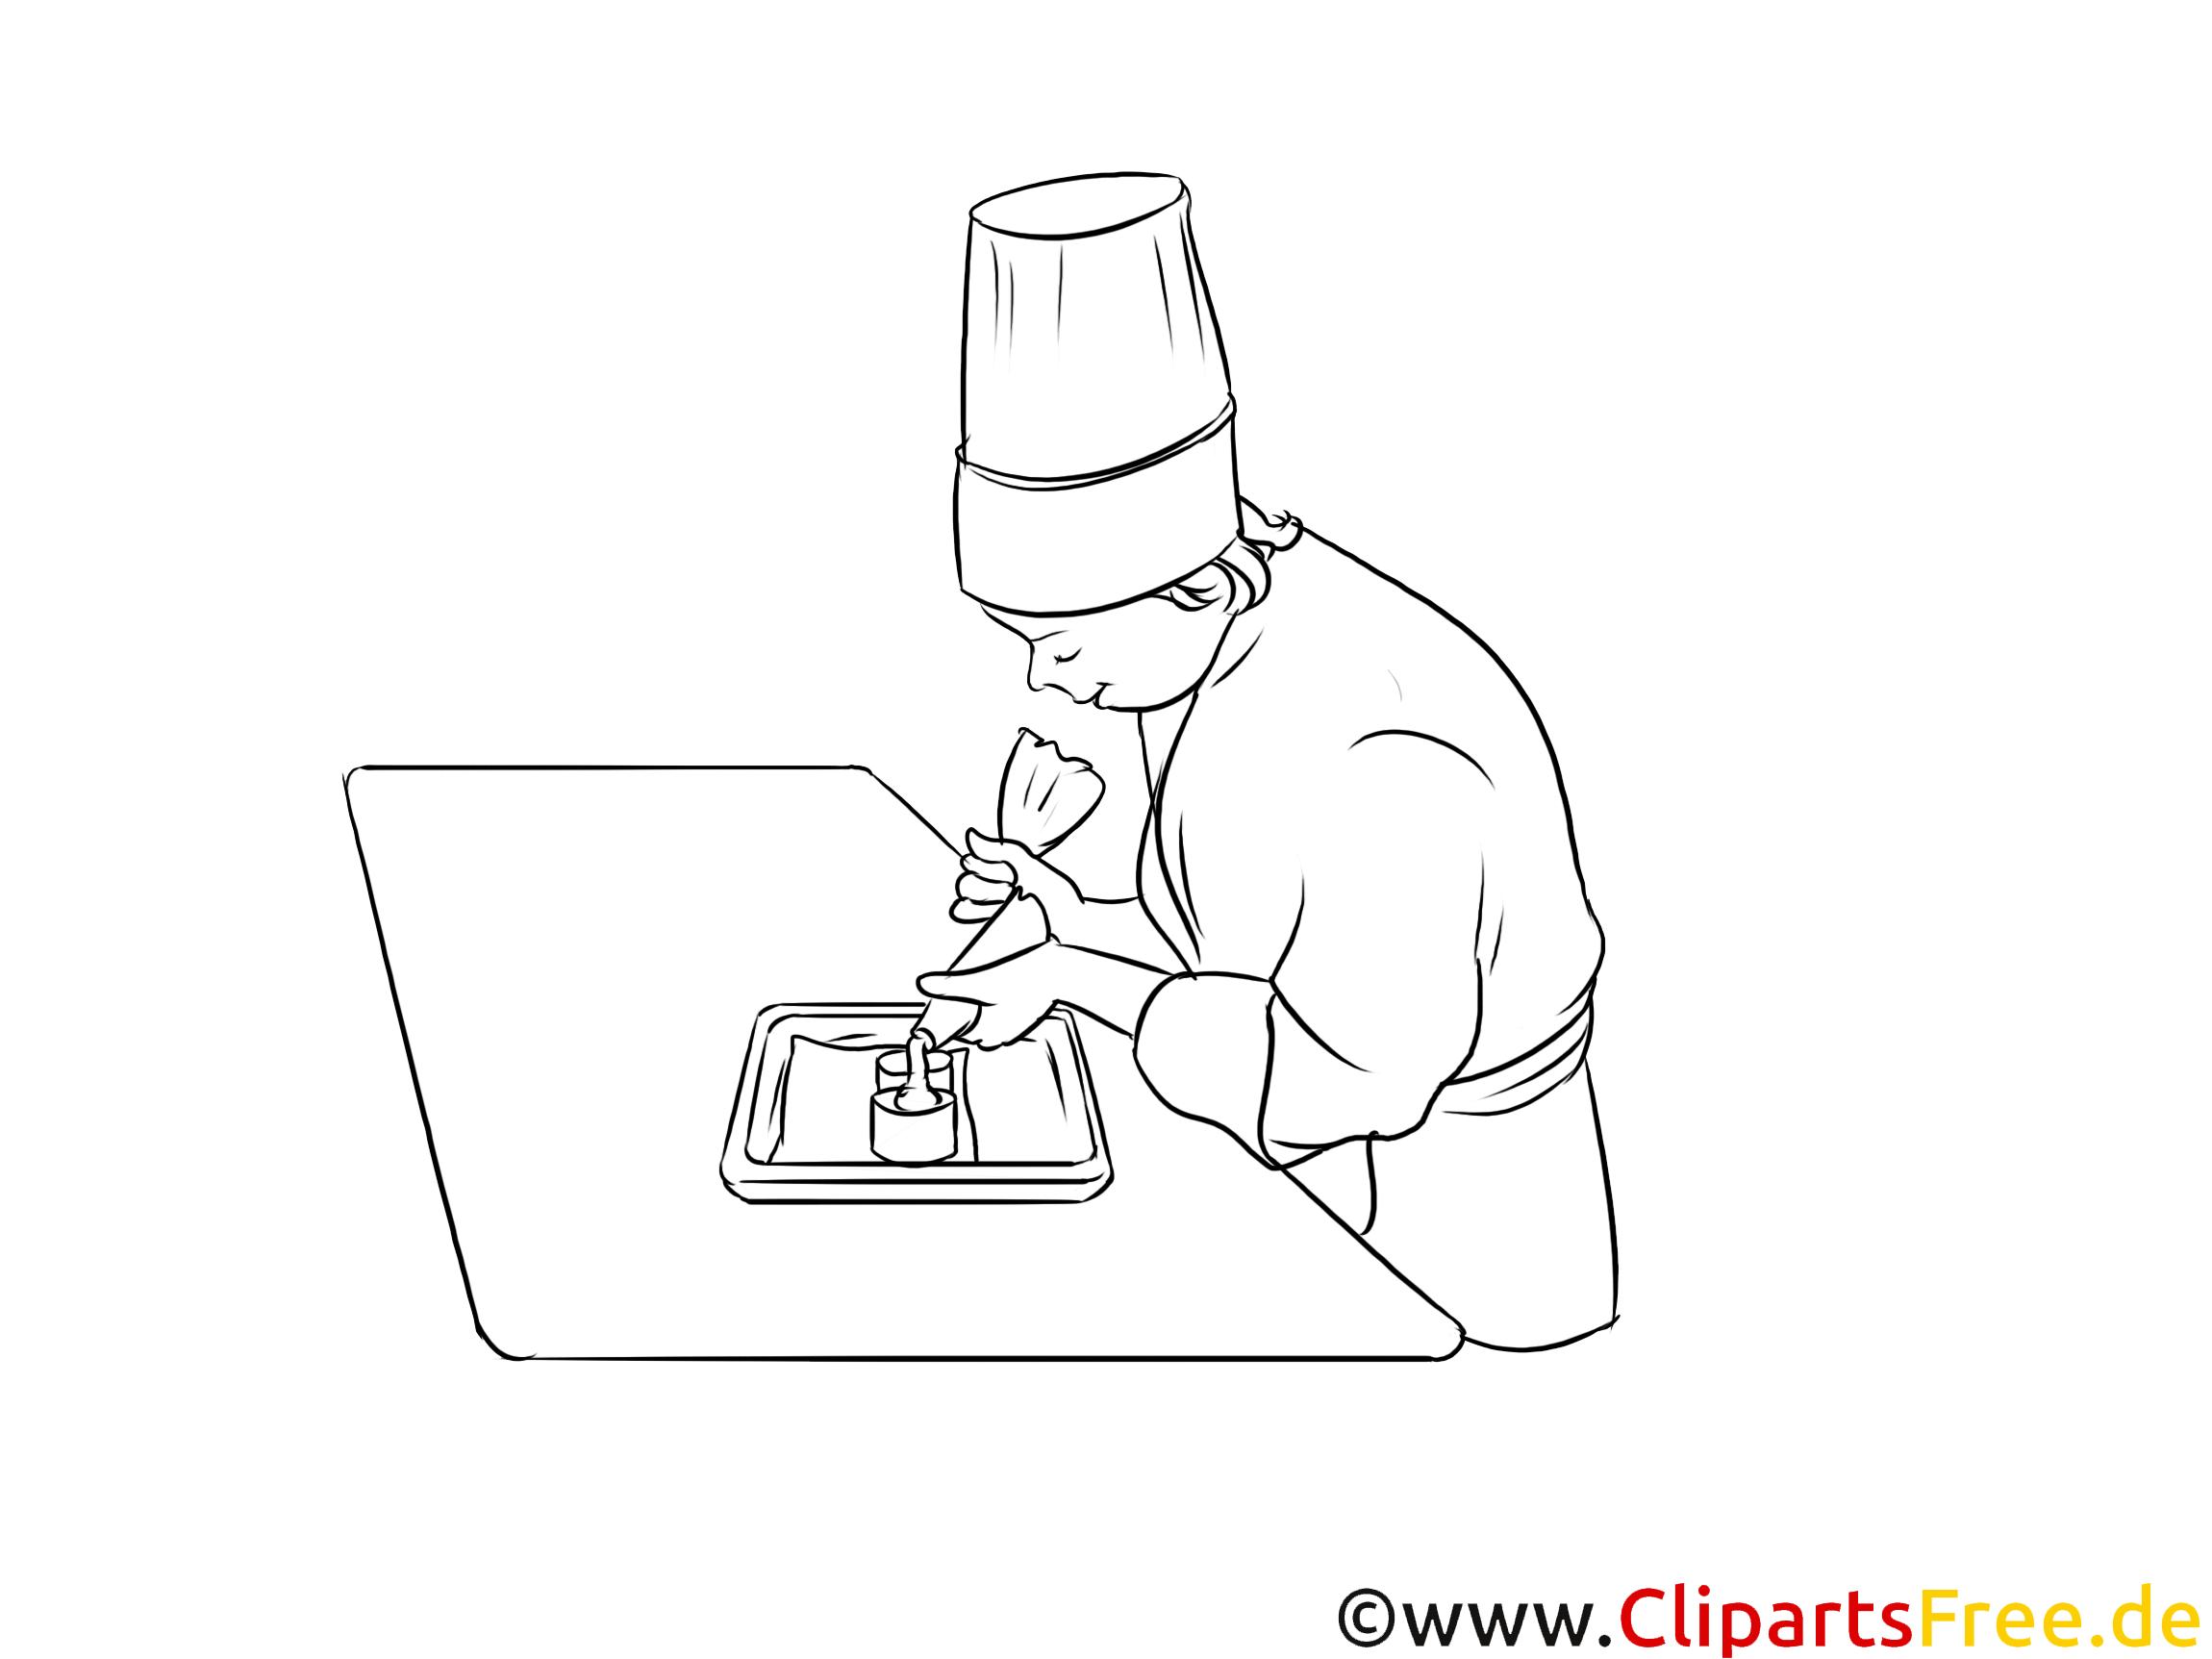 Konditoreifachverkäuferin Bild, Grafik schwarz-weiß